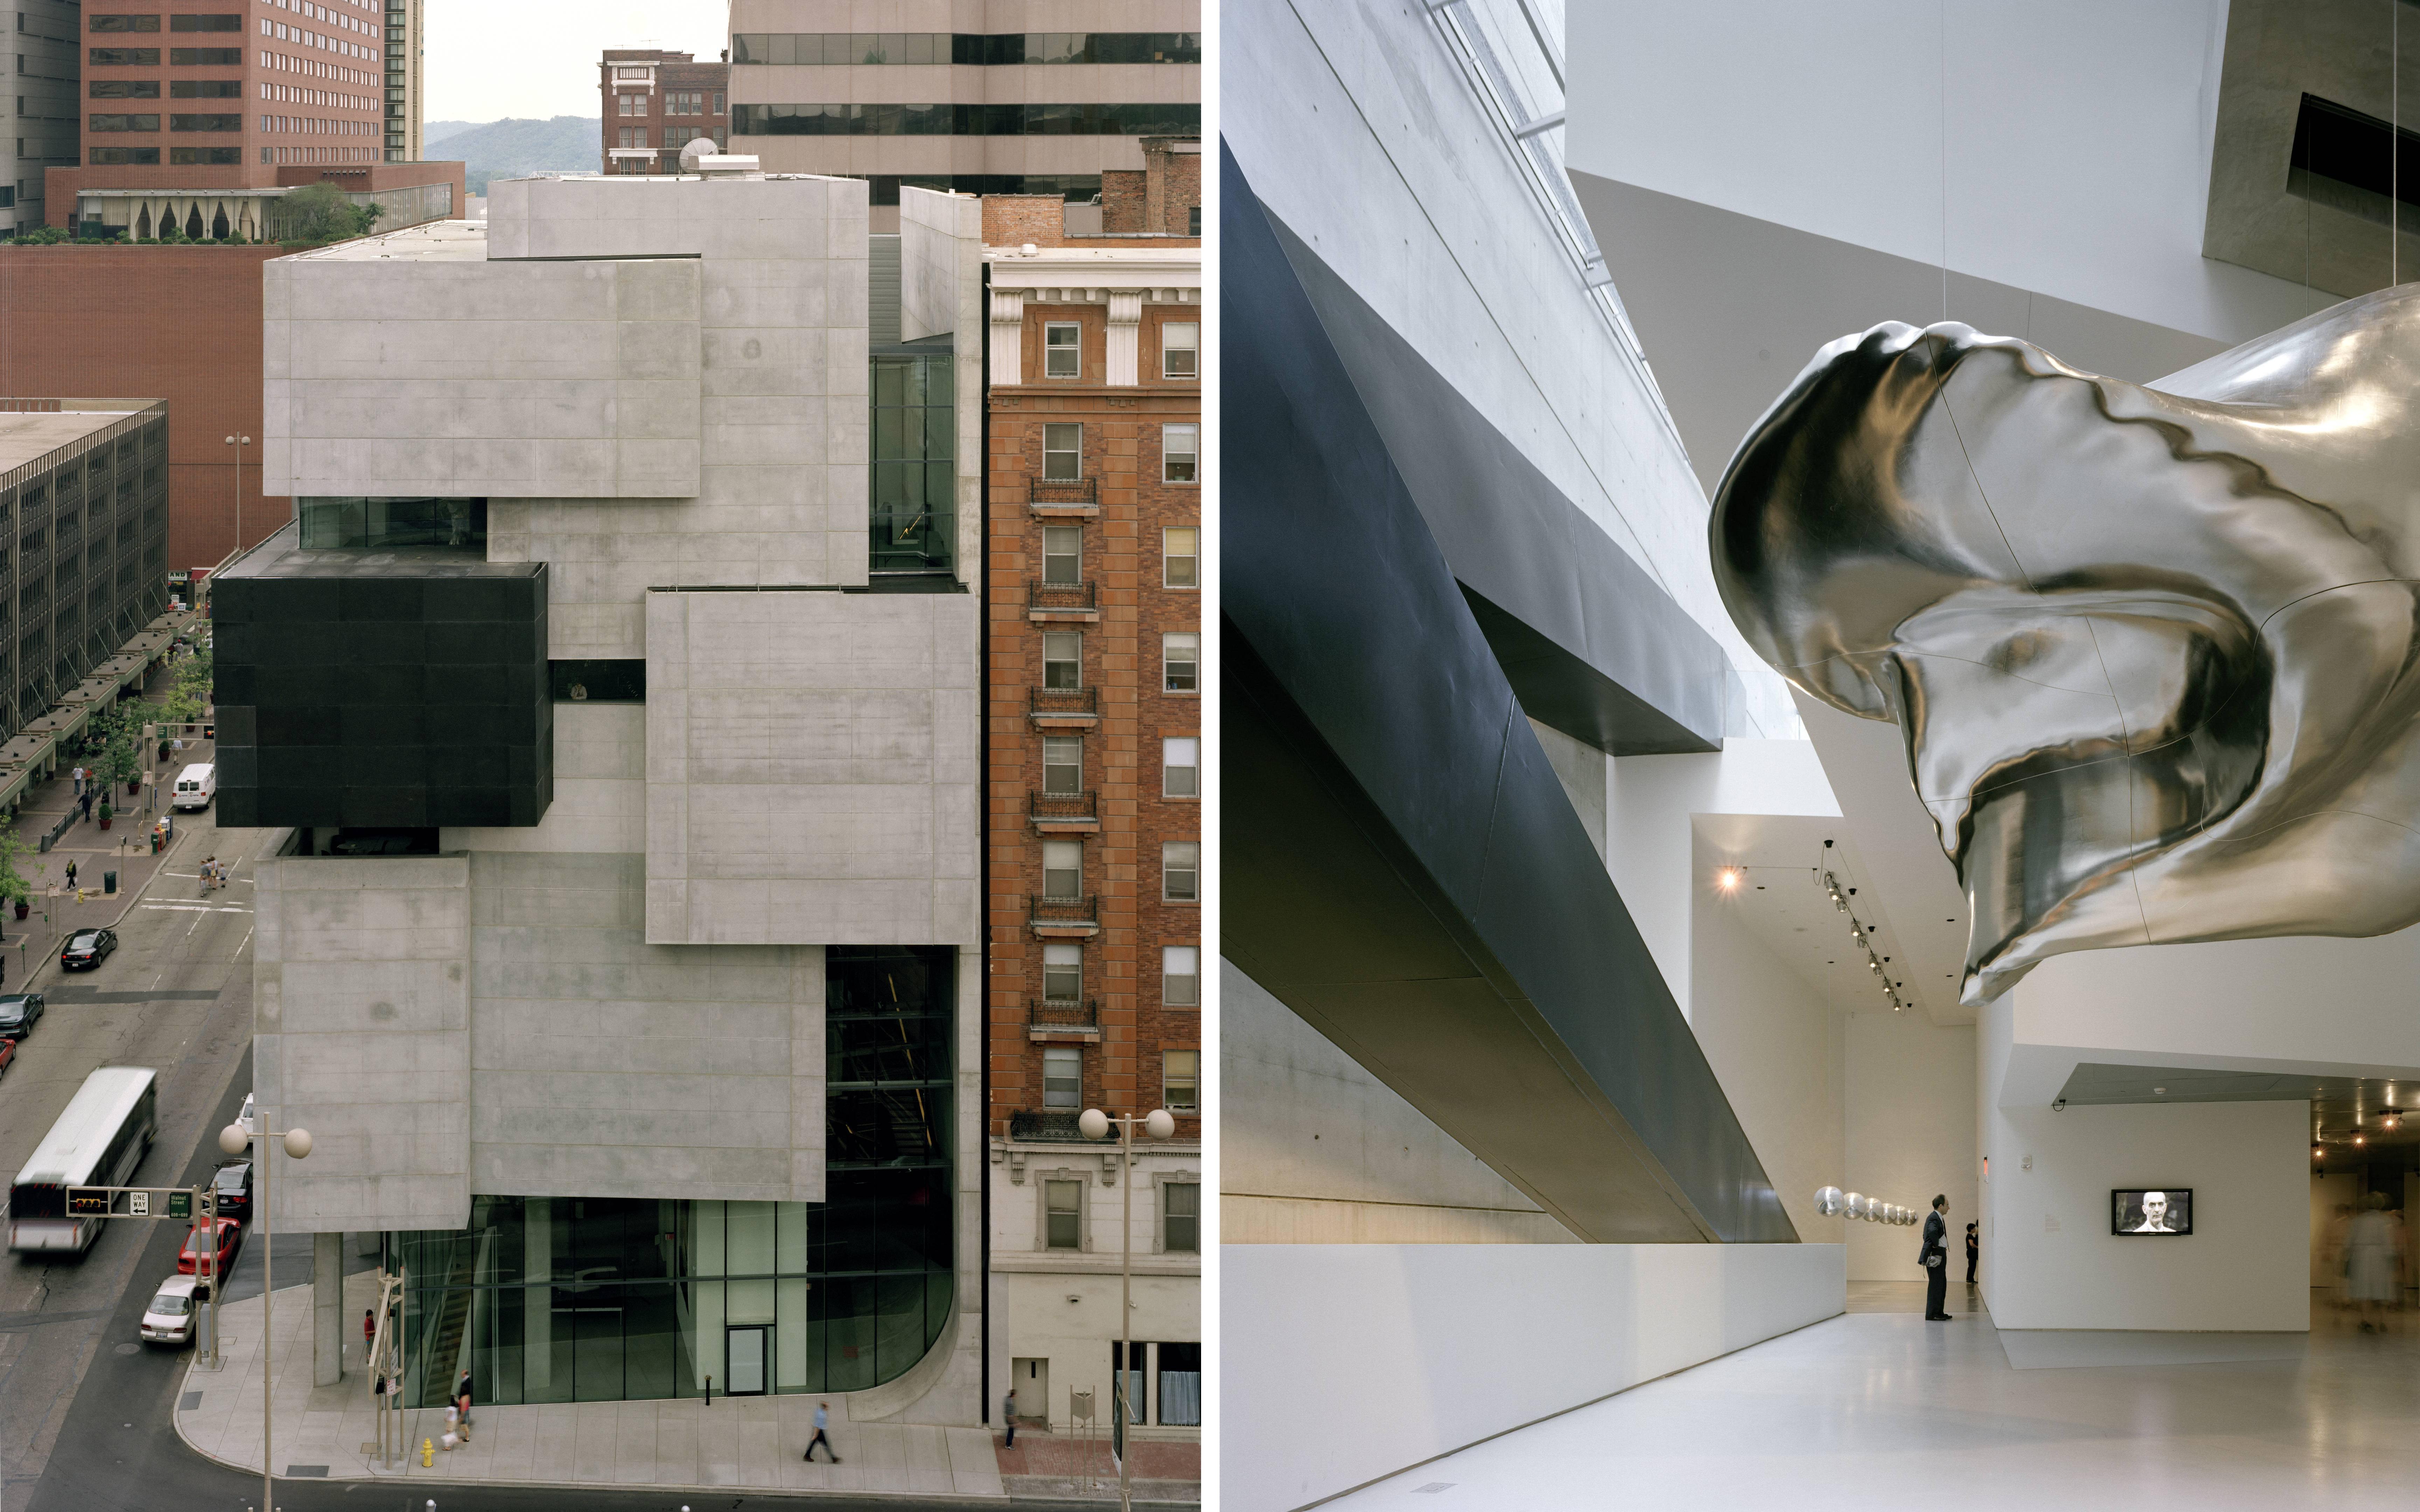 Zaha Hadid Visionary Architect Who Helped Design The Future